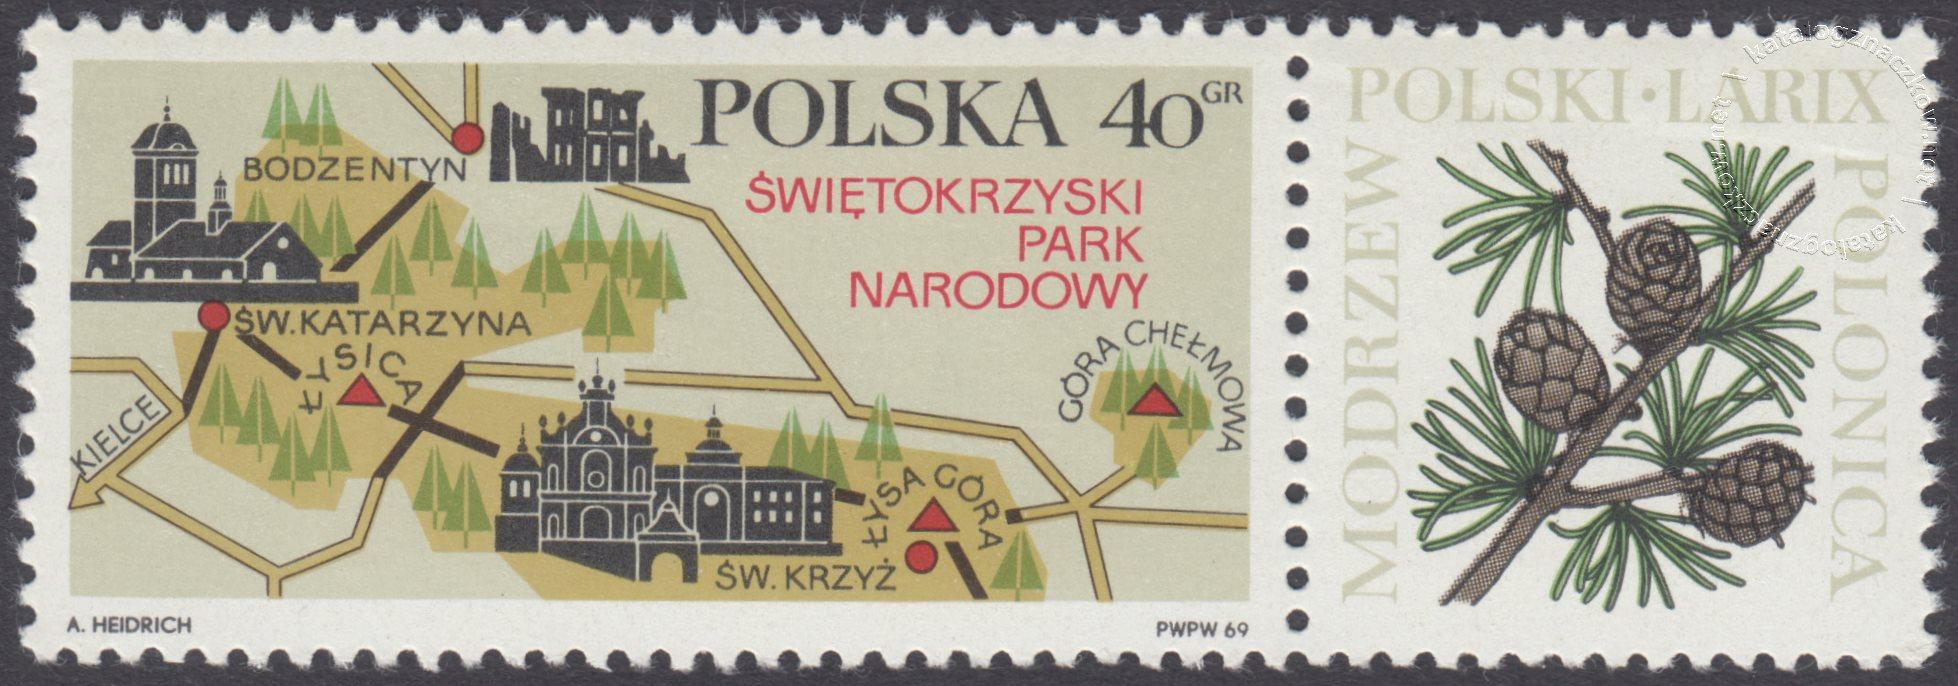 Turystyka znaczek nr 1769